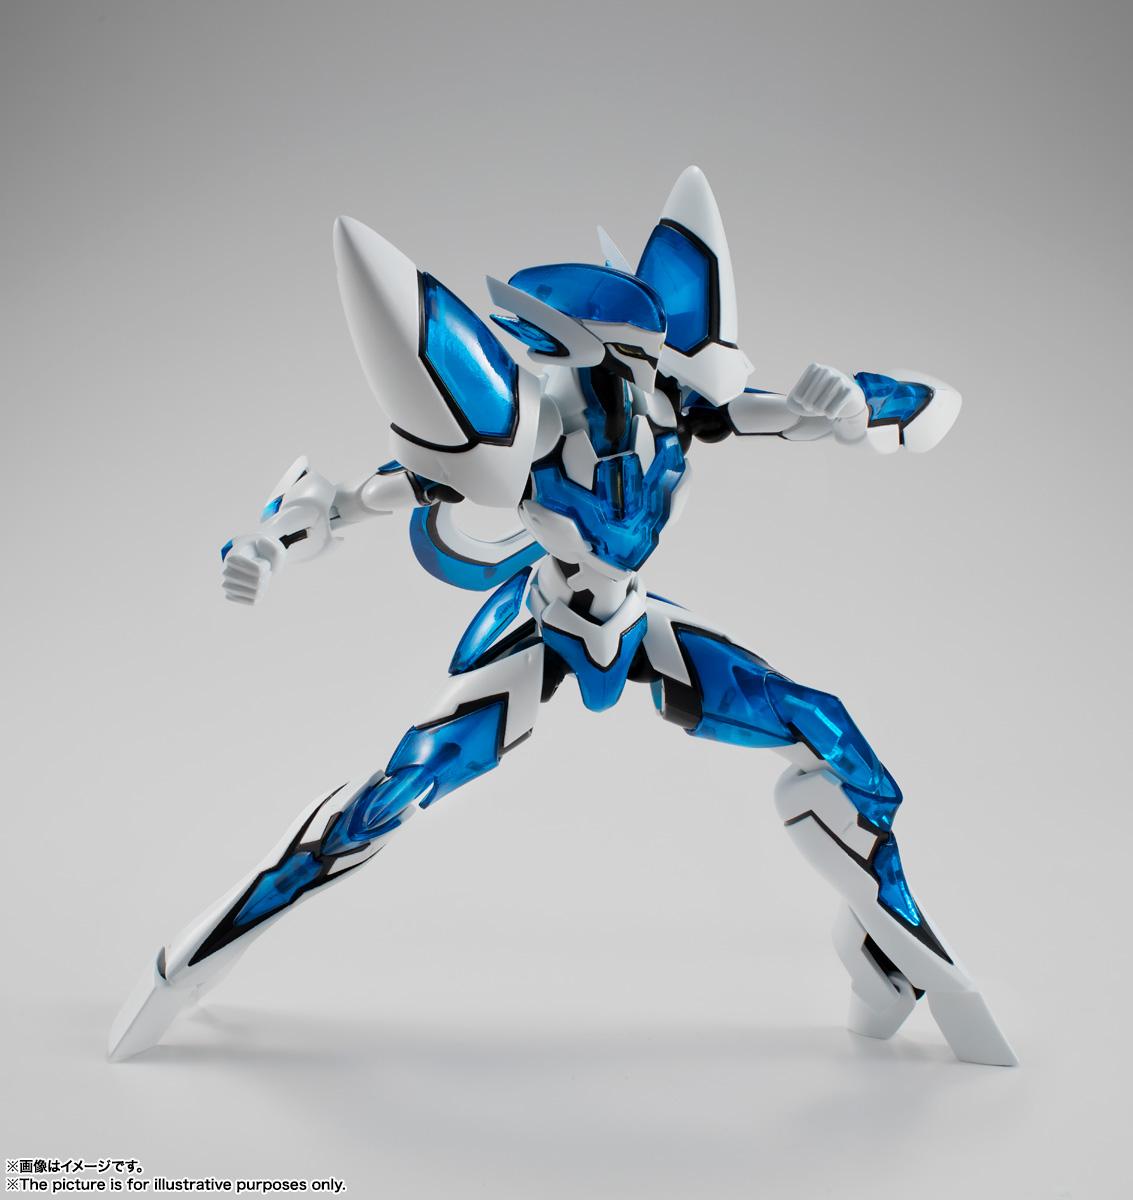 ROBOT魂〈SIDE BH〉『ブライハイト ムガ』バック・アロウ 可動フィギュア-003